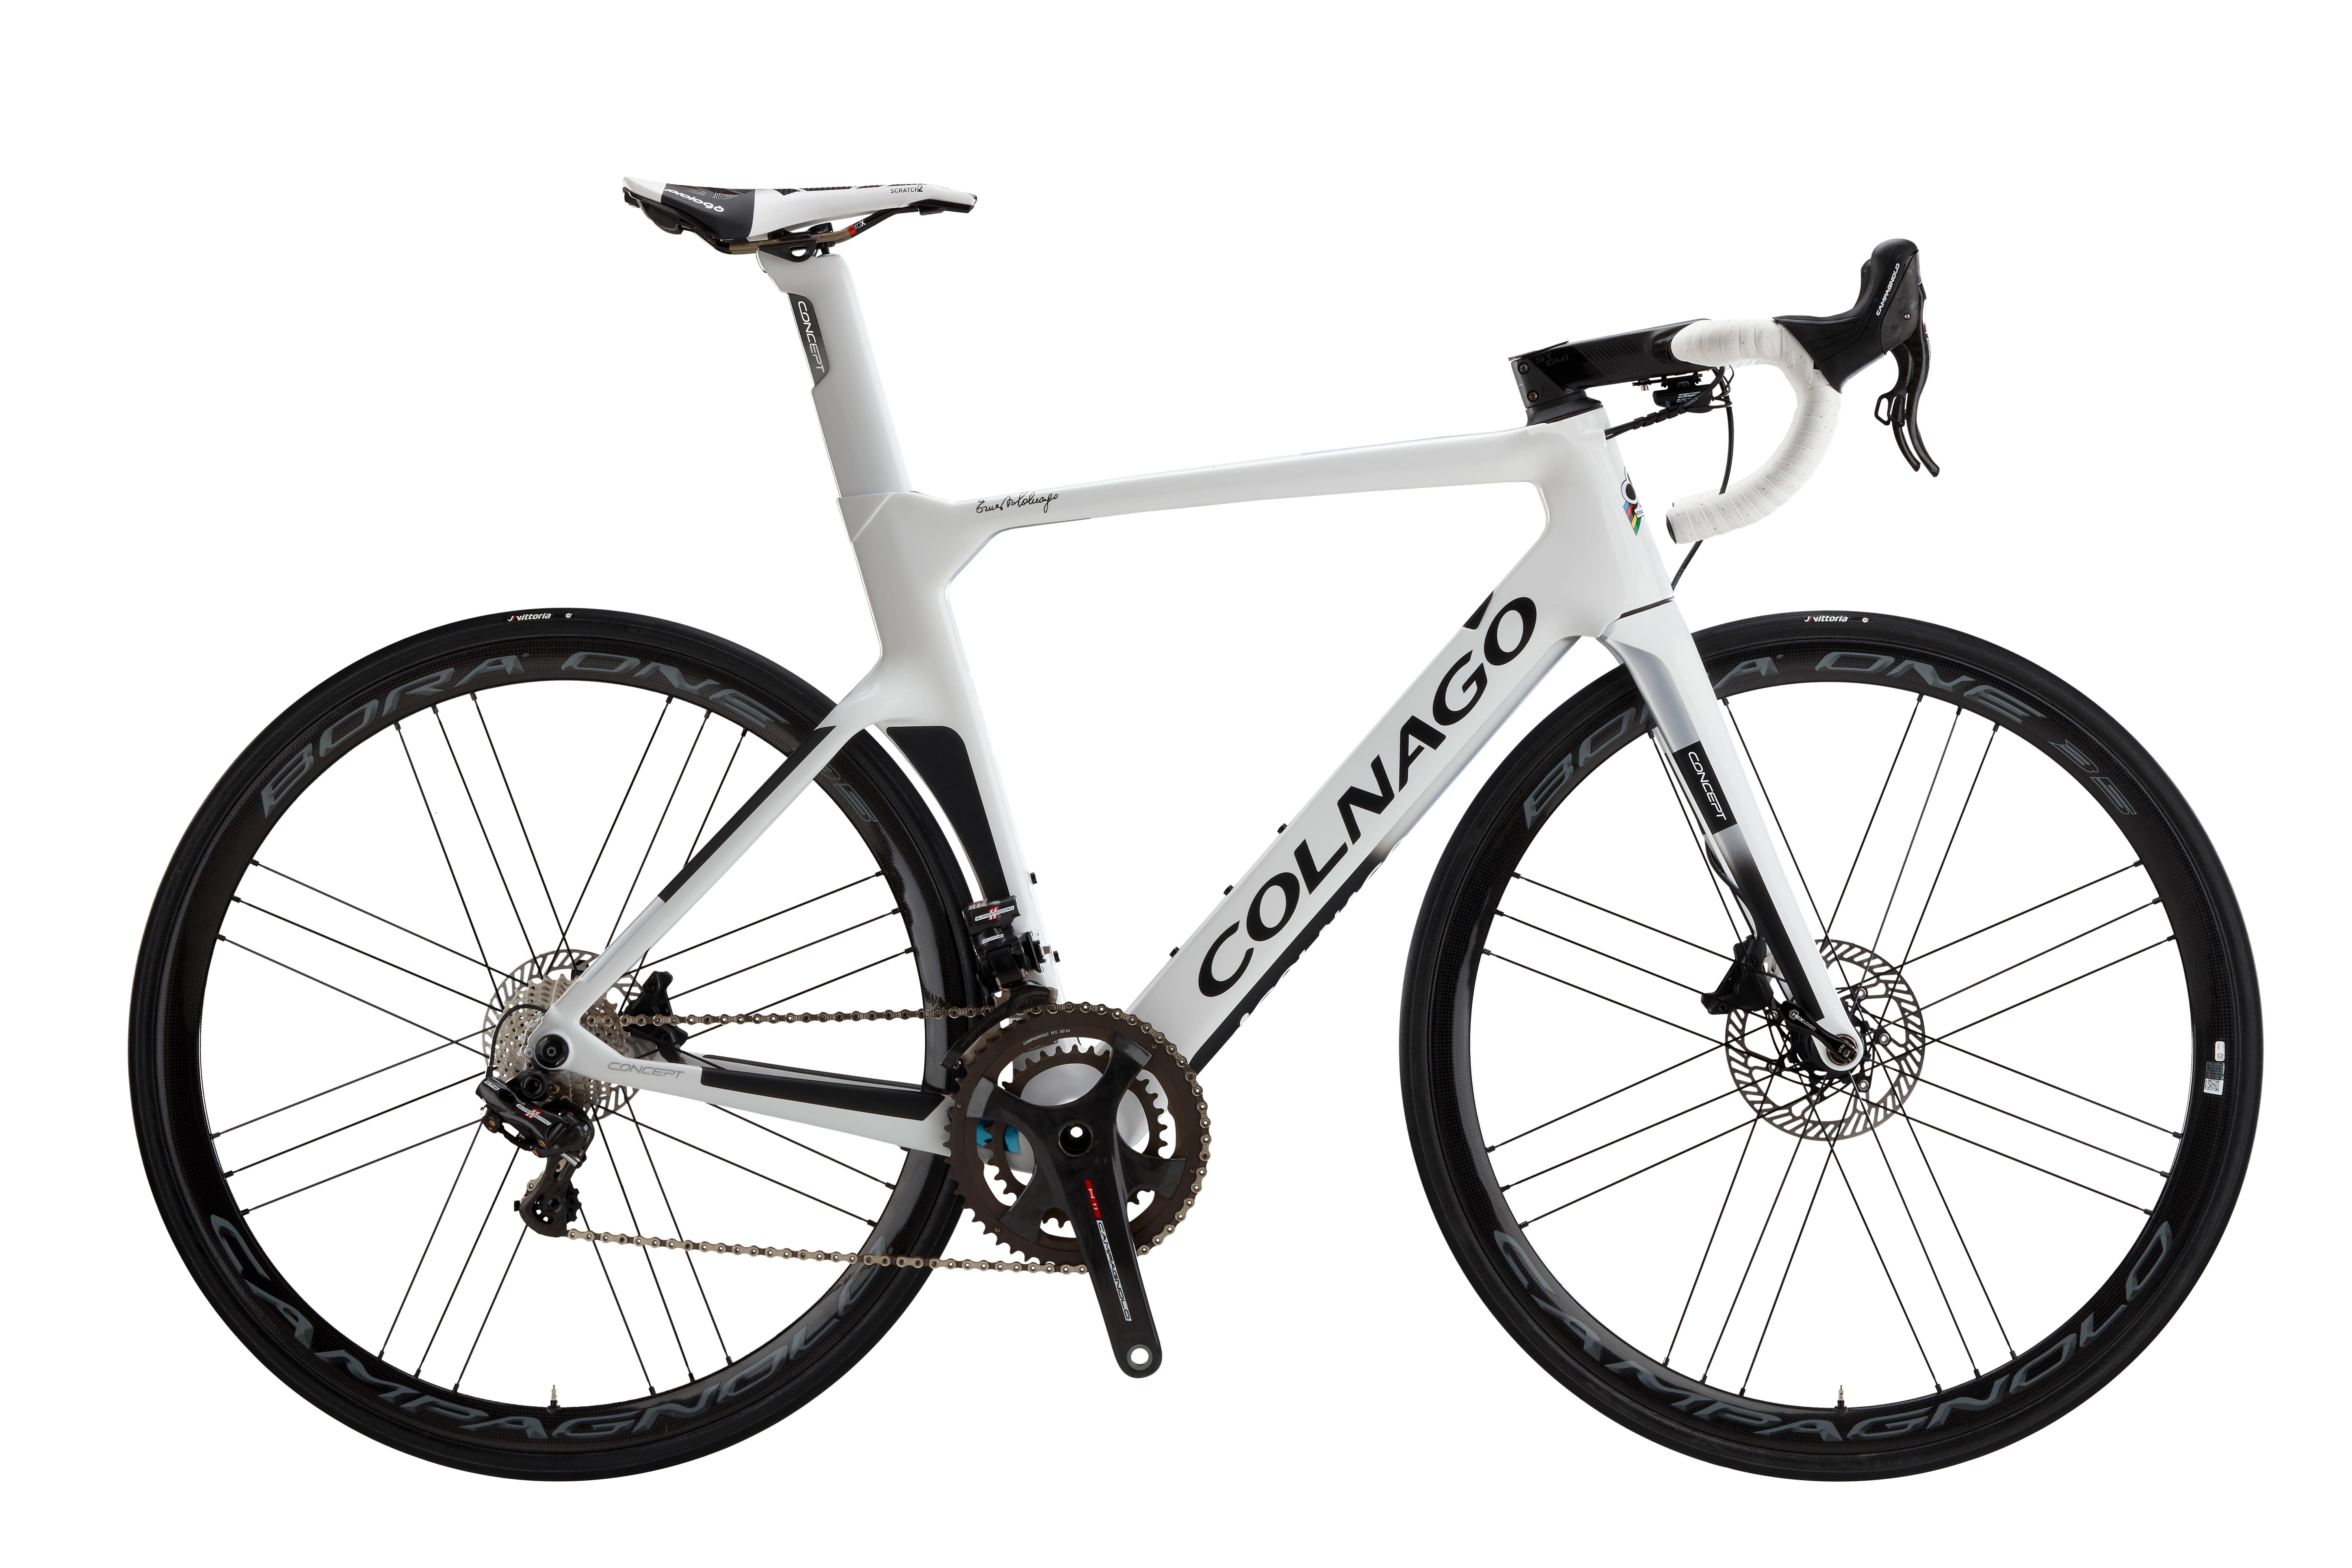 Road Bike Concept